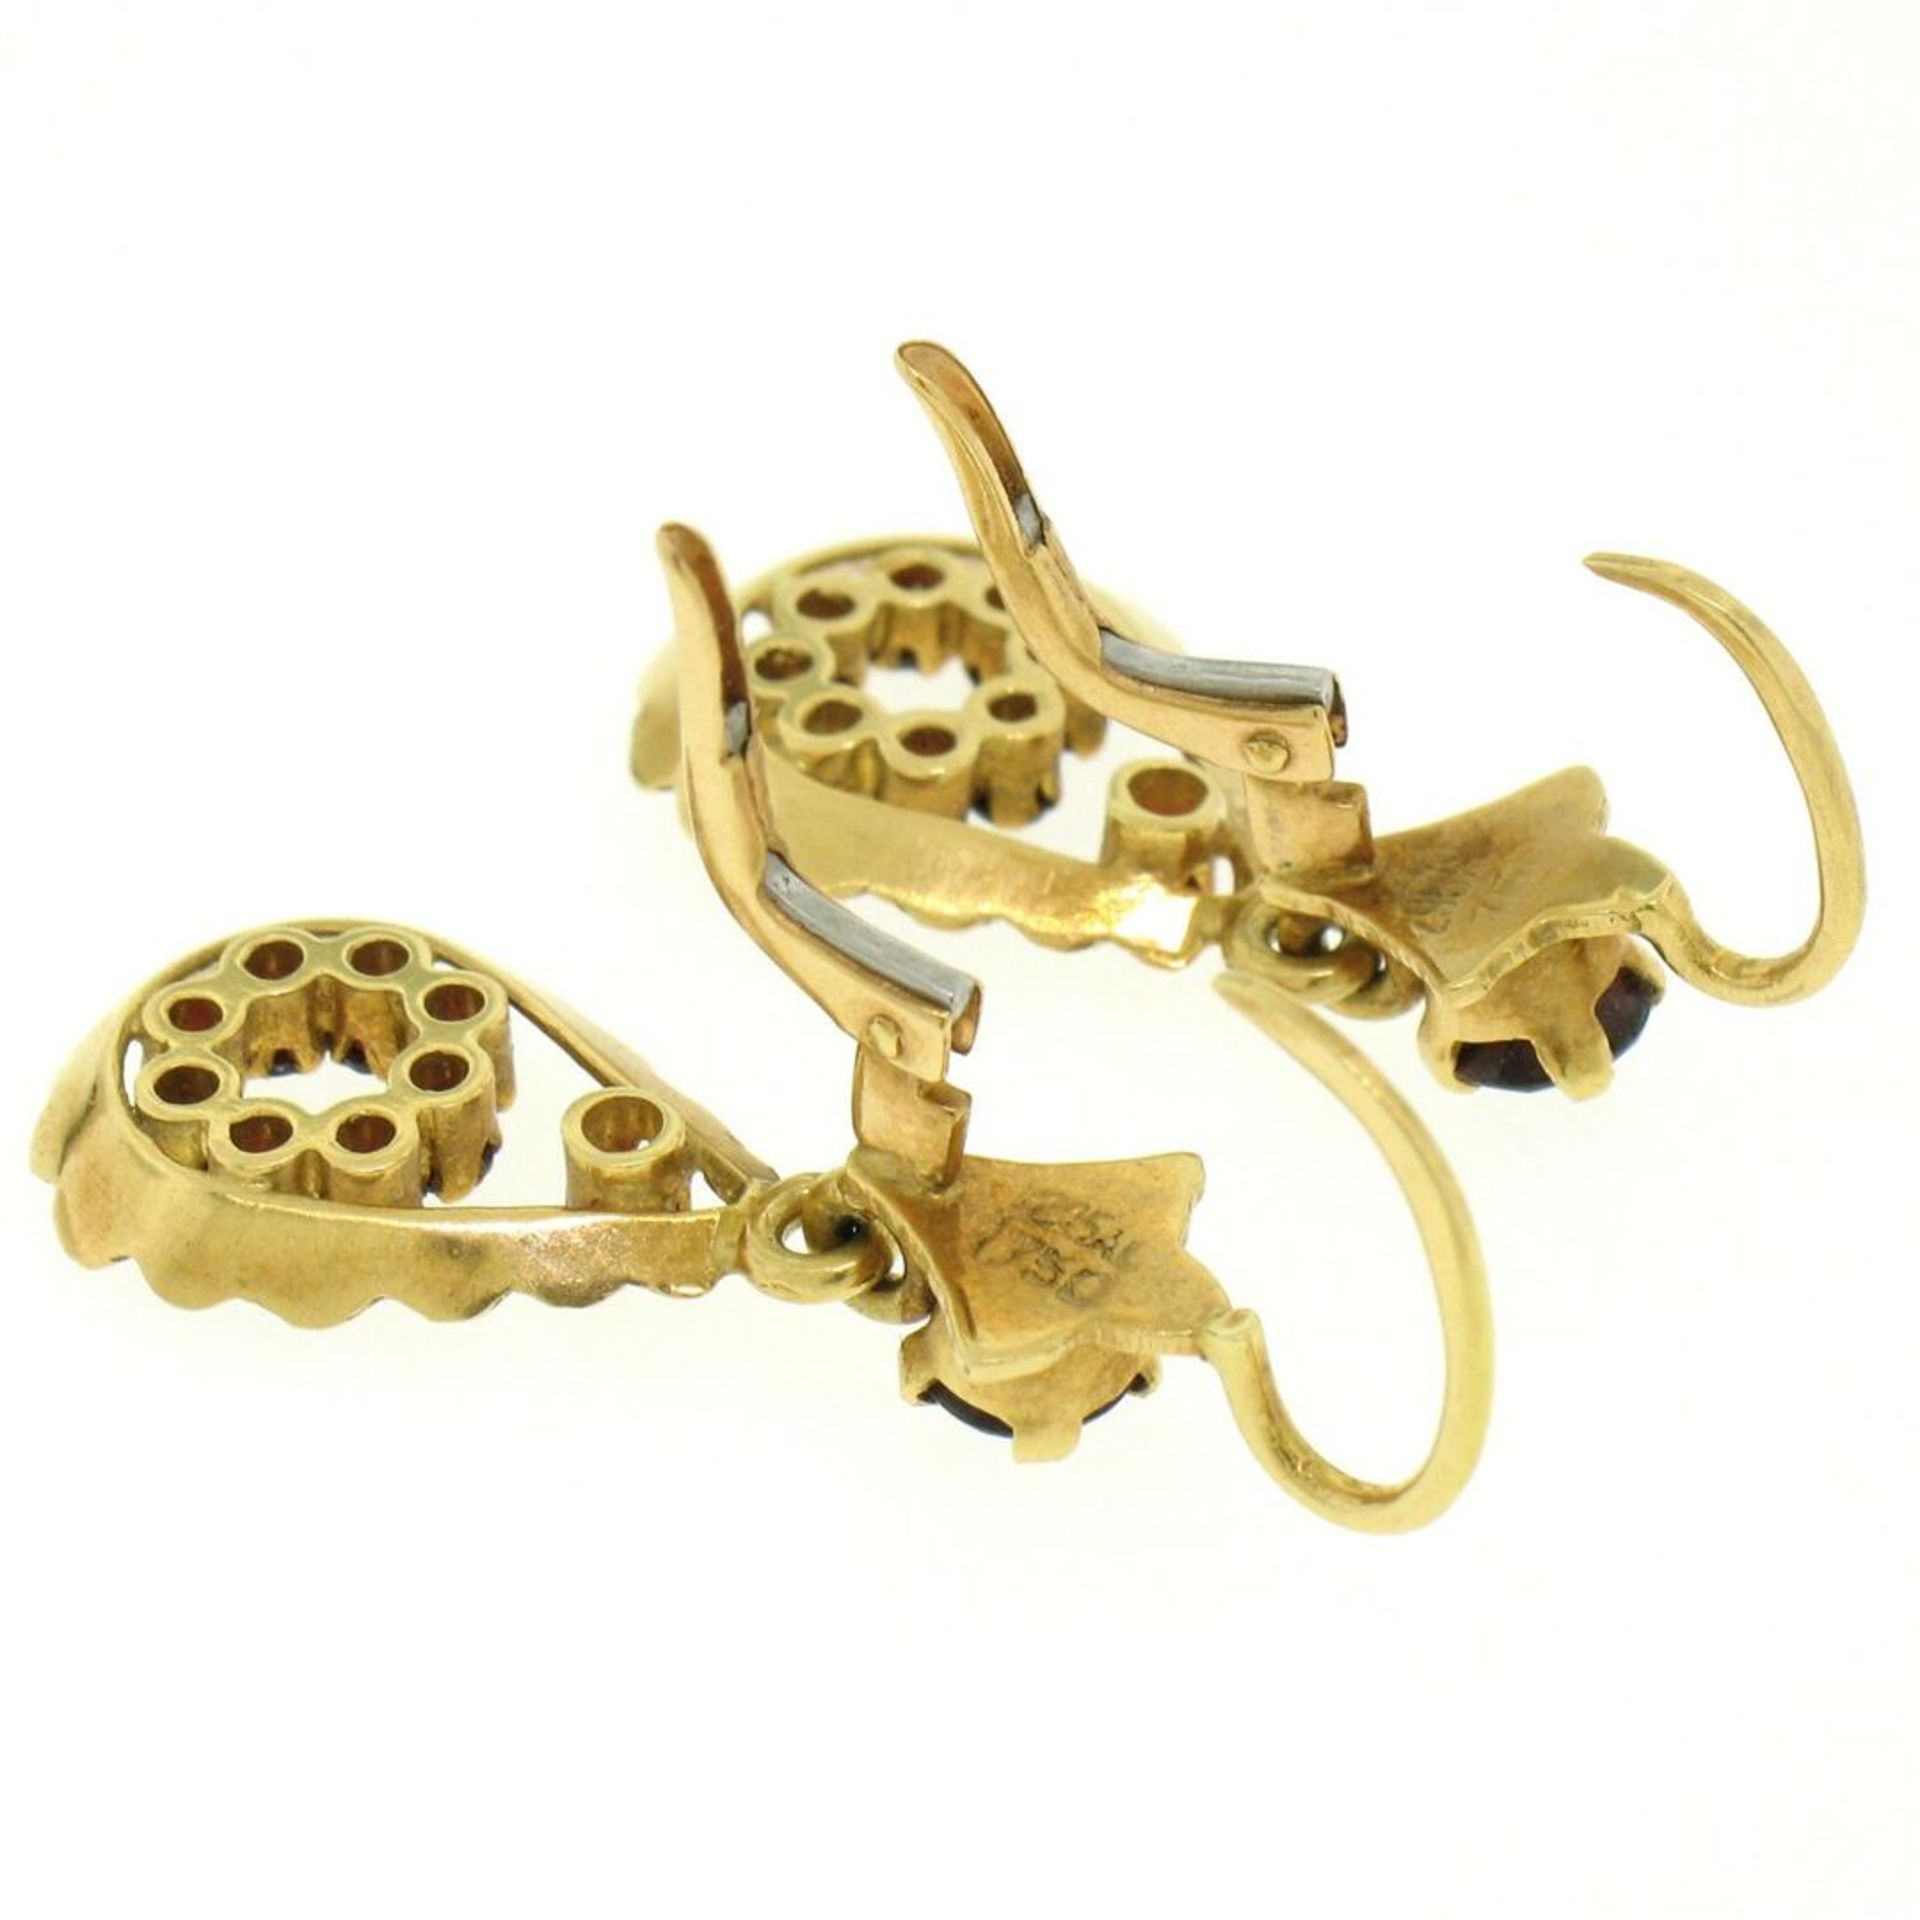 Vintage 18K Yellow Gold 1.0 ctw Pear Shape Garnet Dangle Drop Lever Back Earring - Image 6 of 8